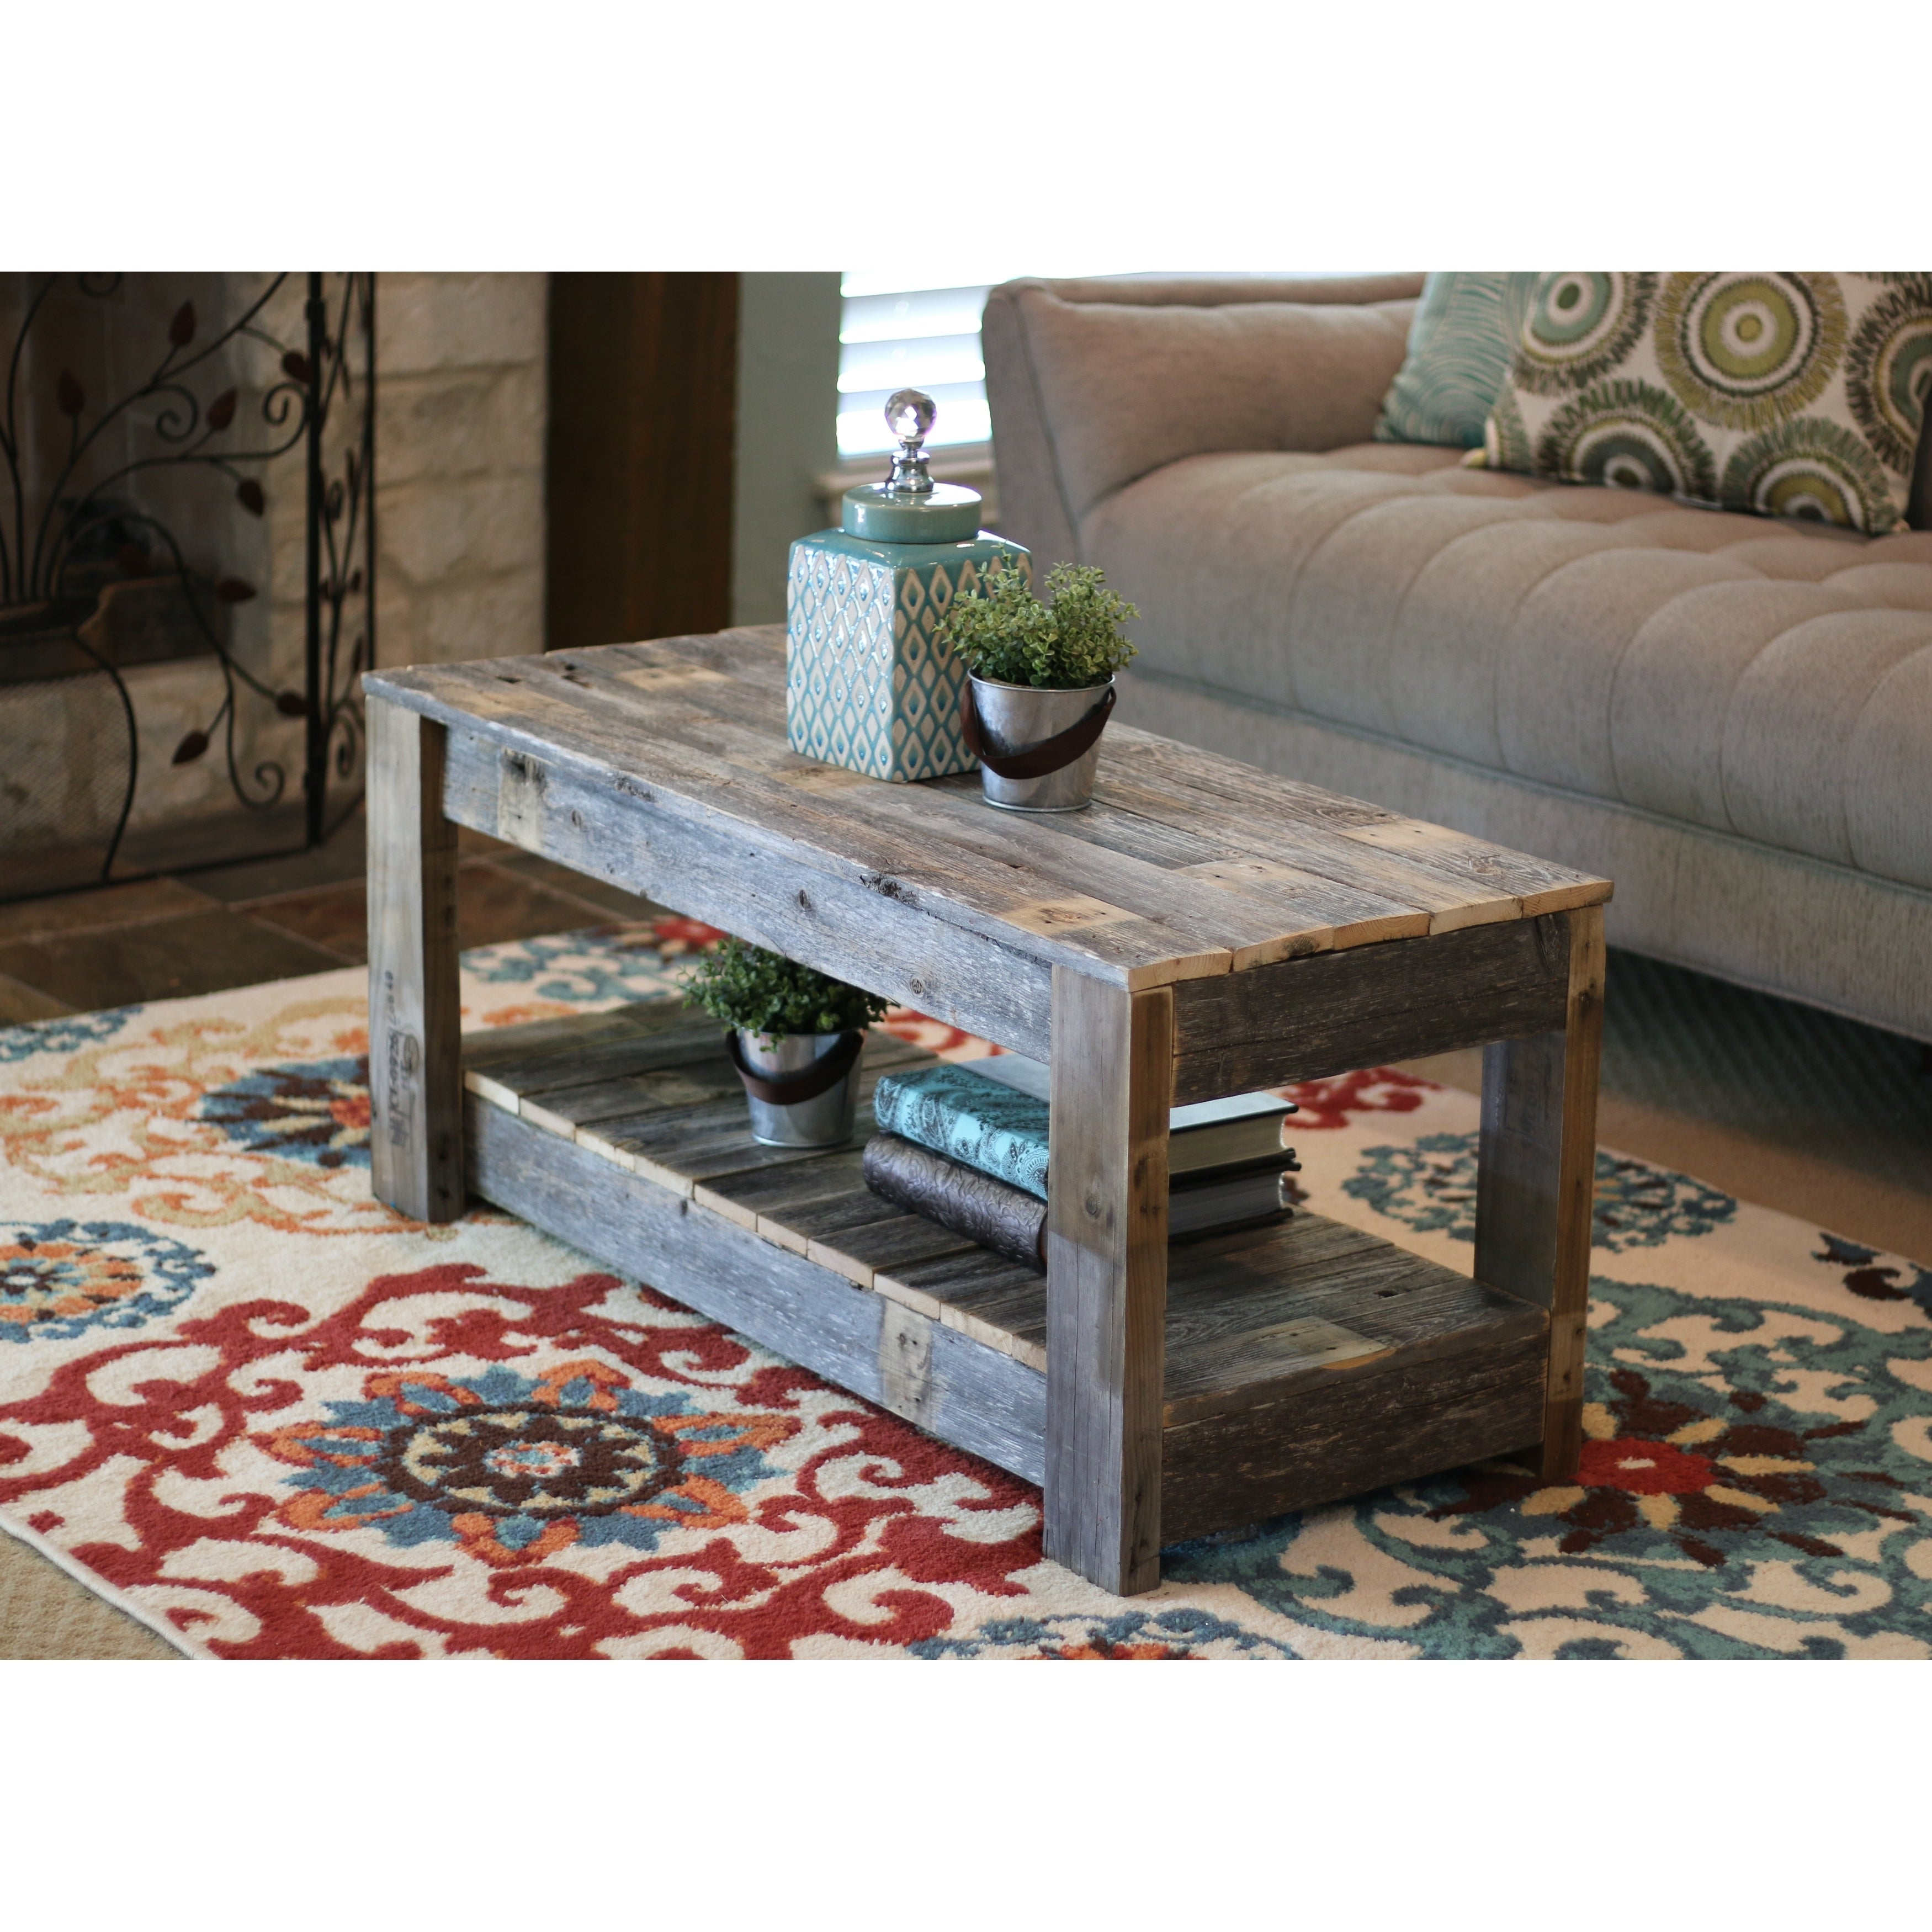 Original Farmhouse Coffee Table On Sale Overstock 25602398